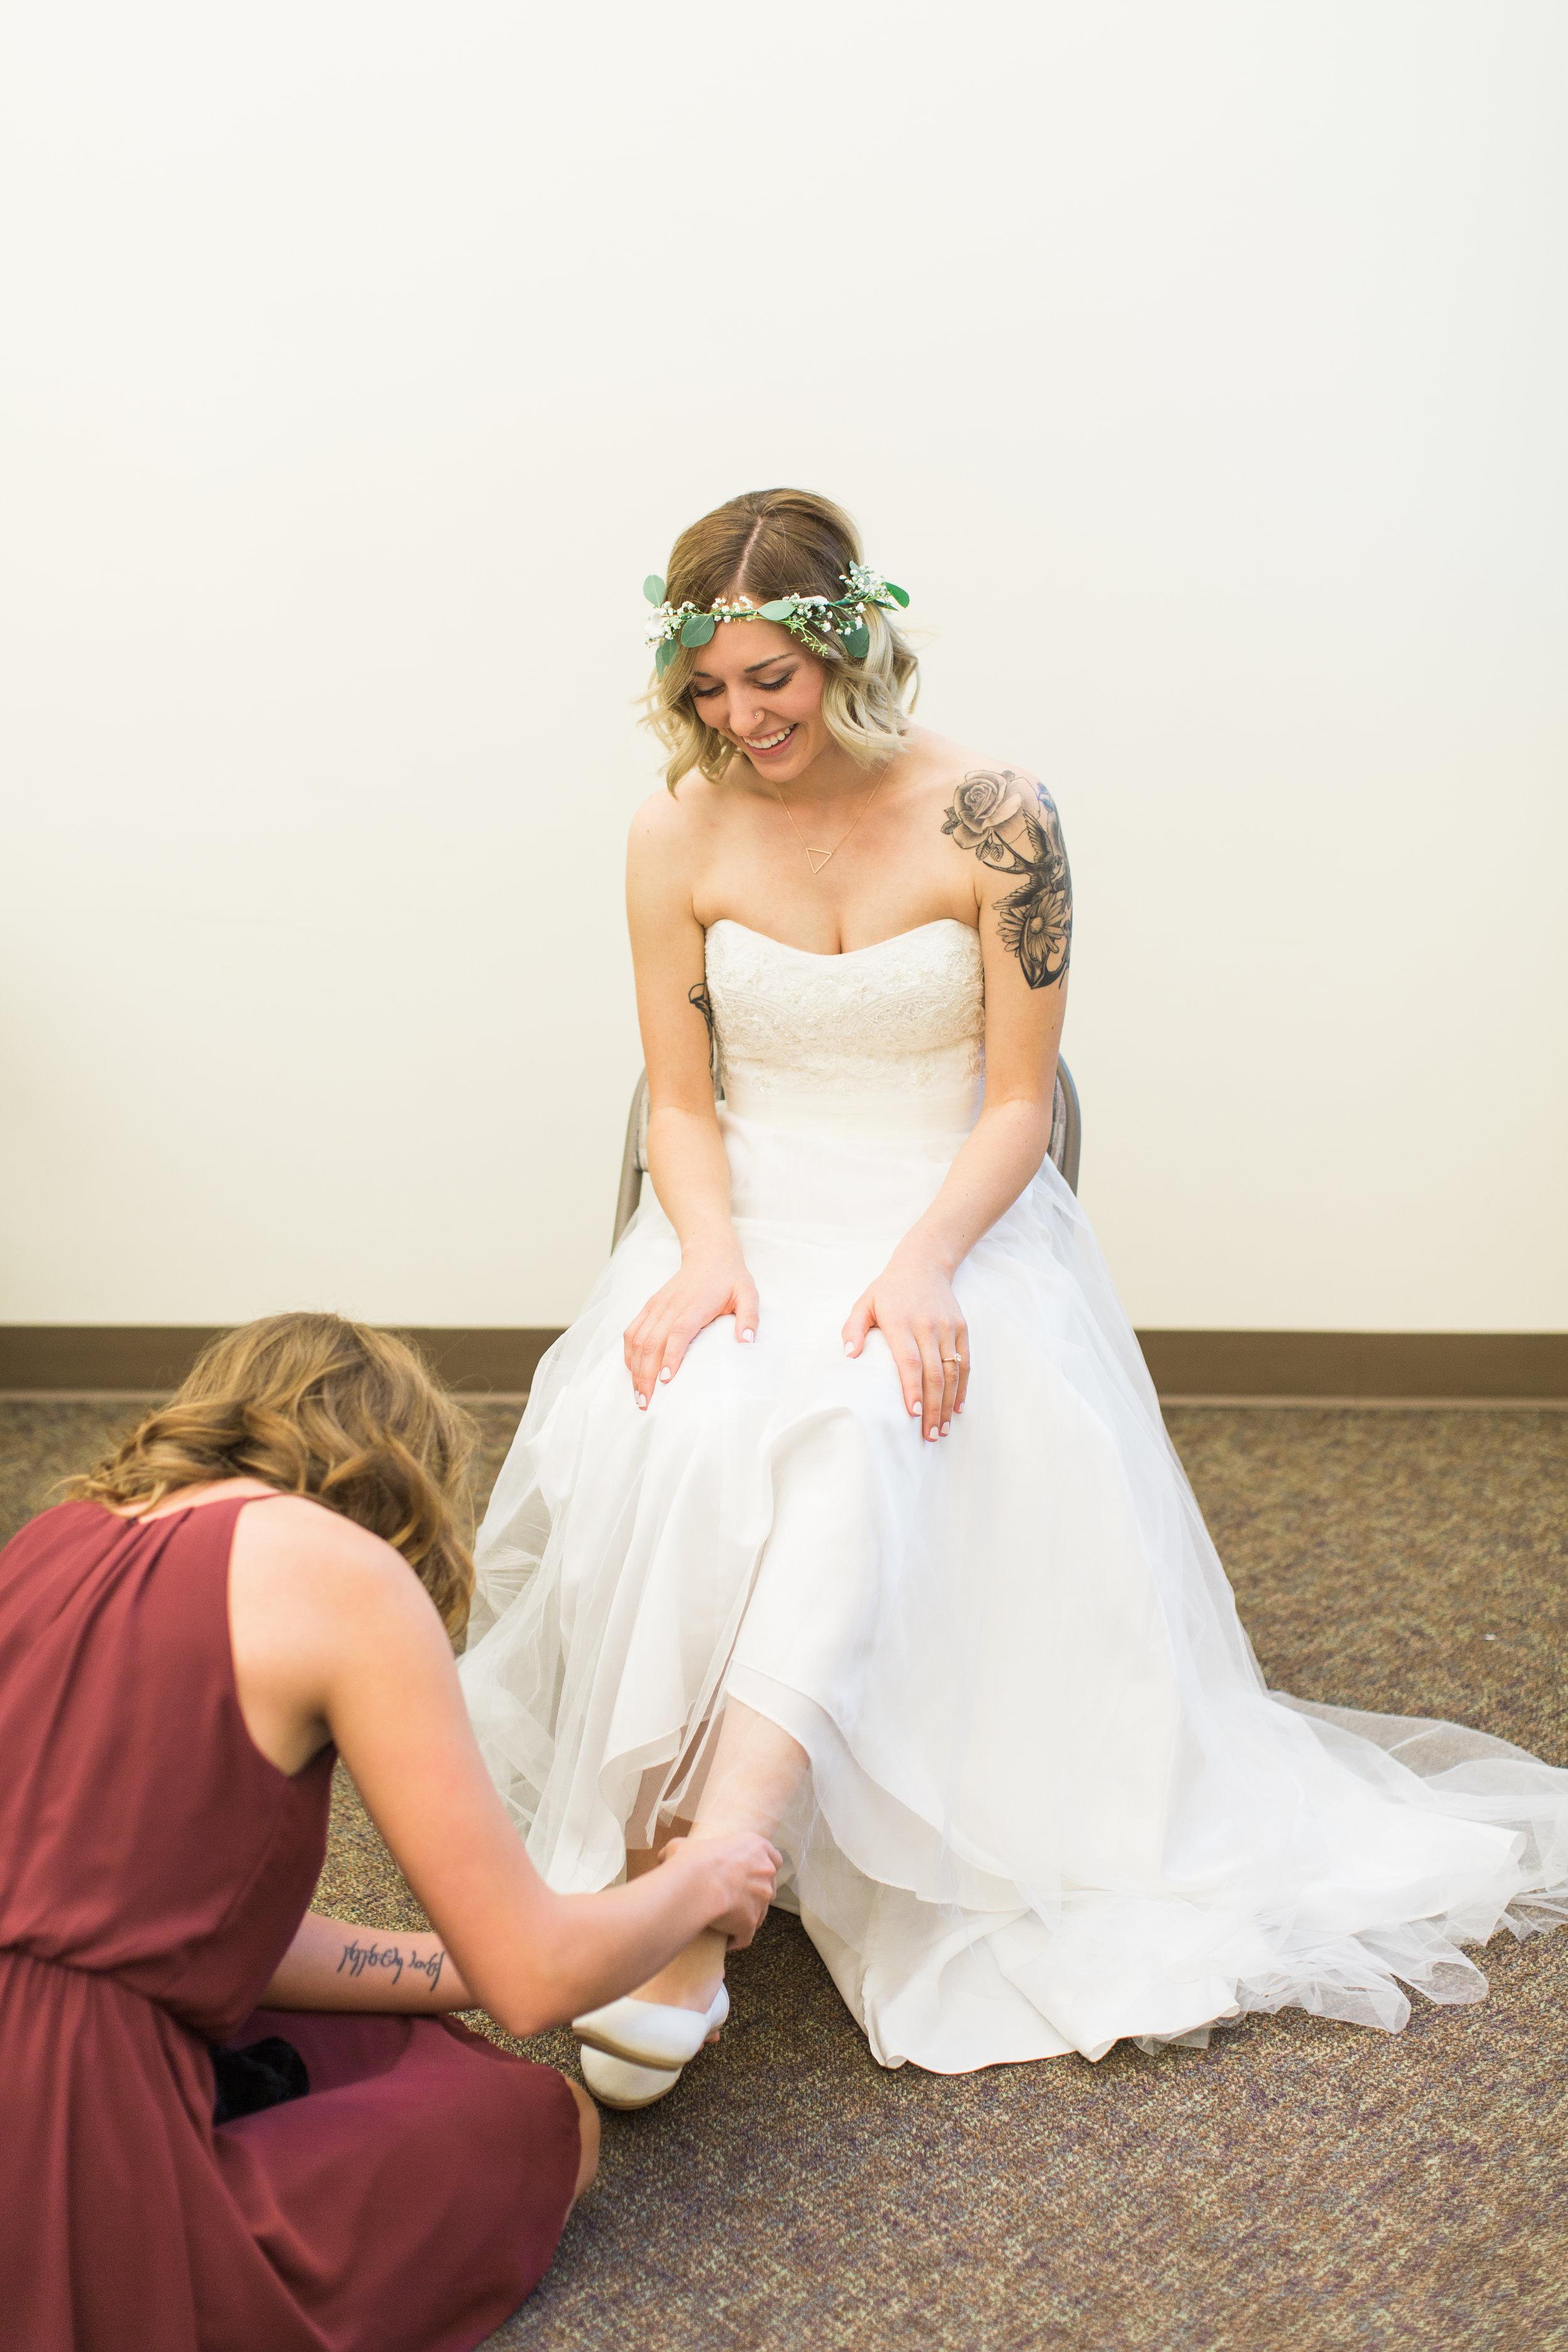 clayton+kennedy-married-49.jpg